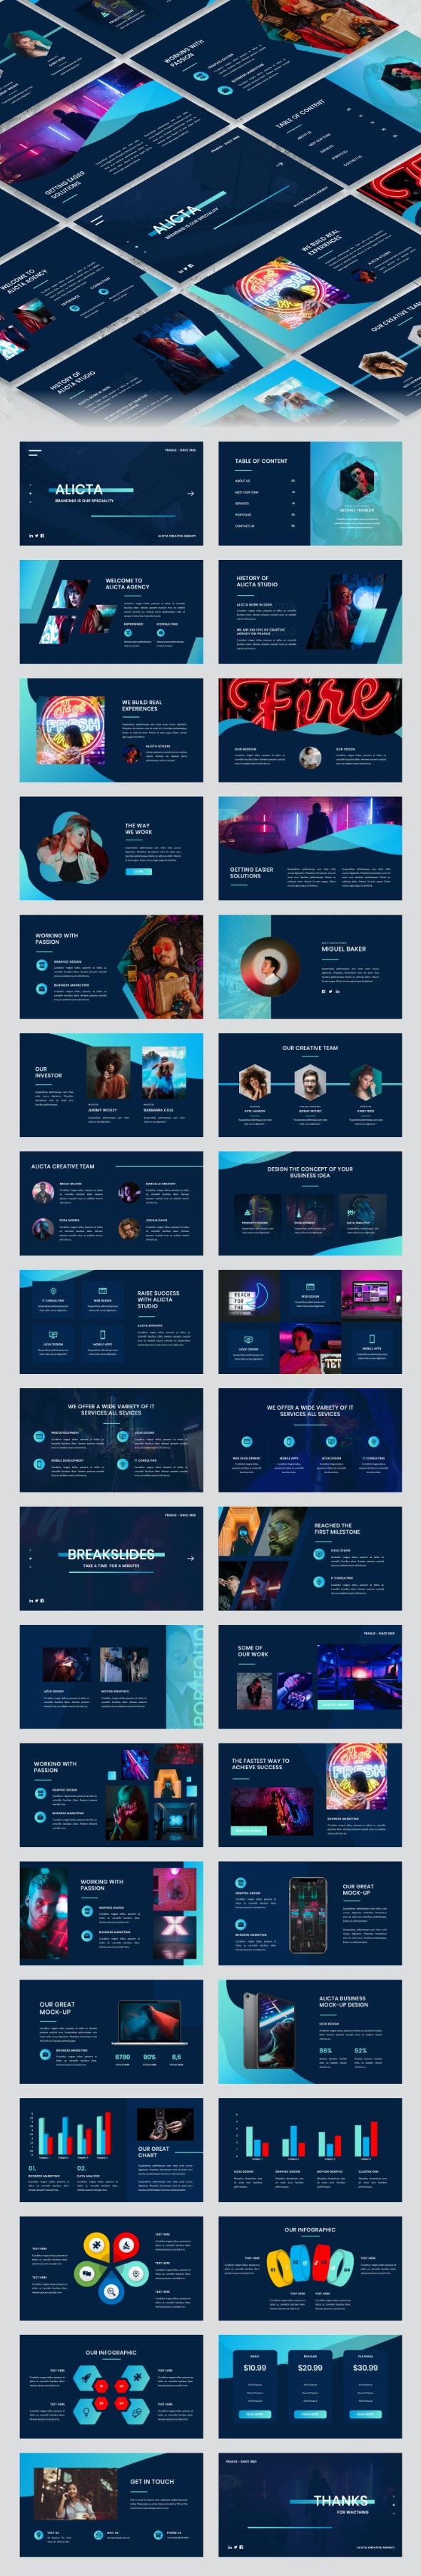 Alicta - Creative Agency PowerPoint Template - Creative PowerPoint Templates